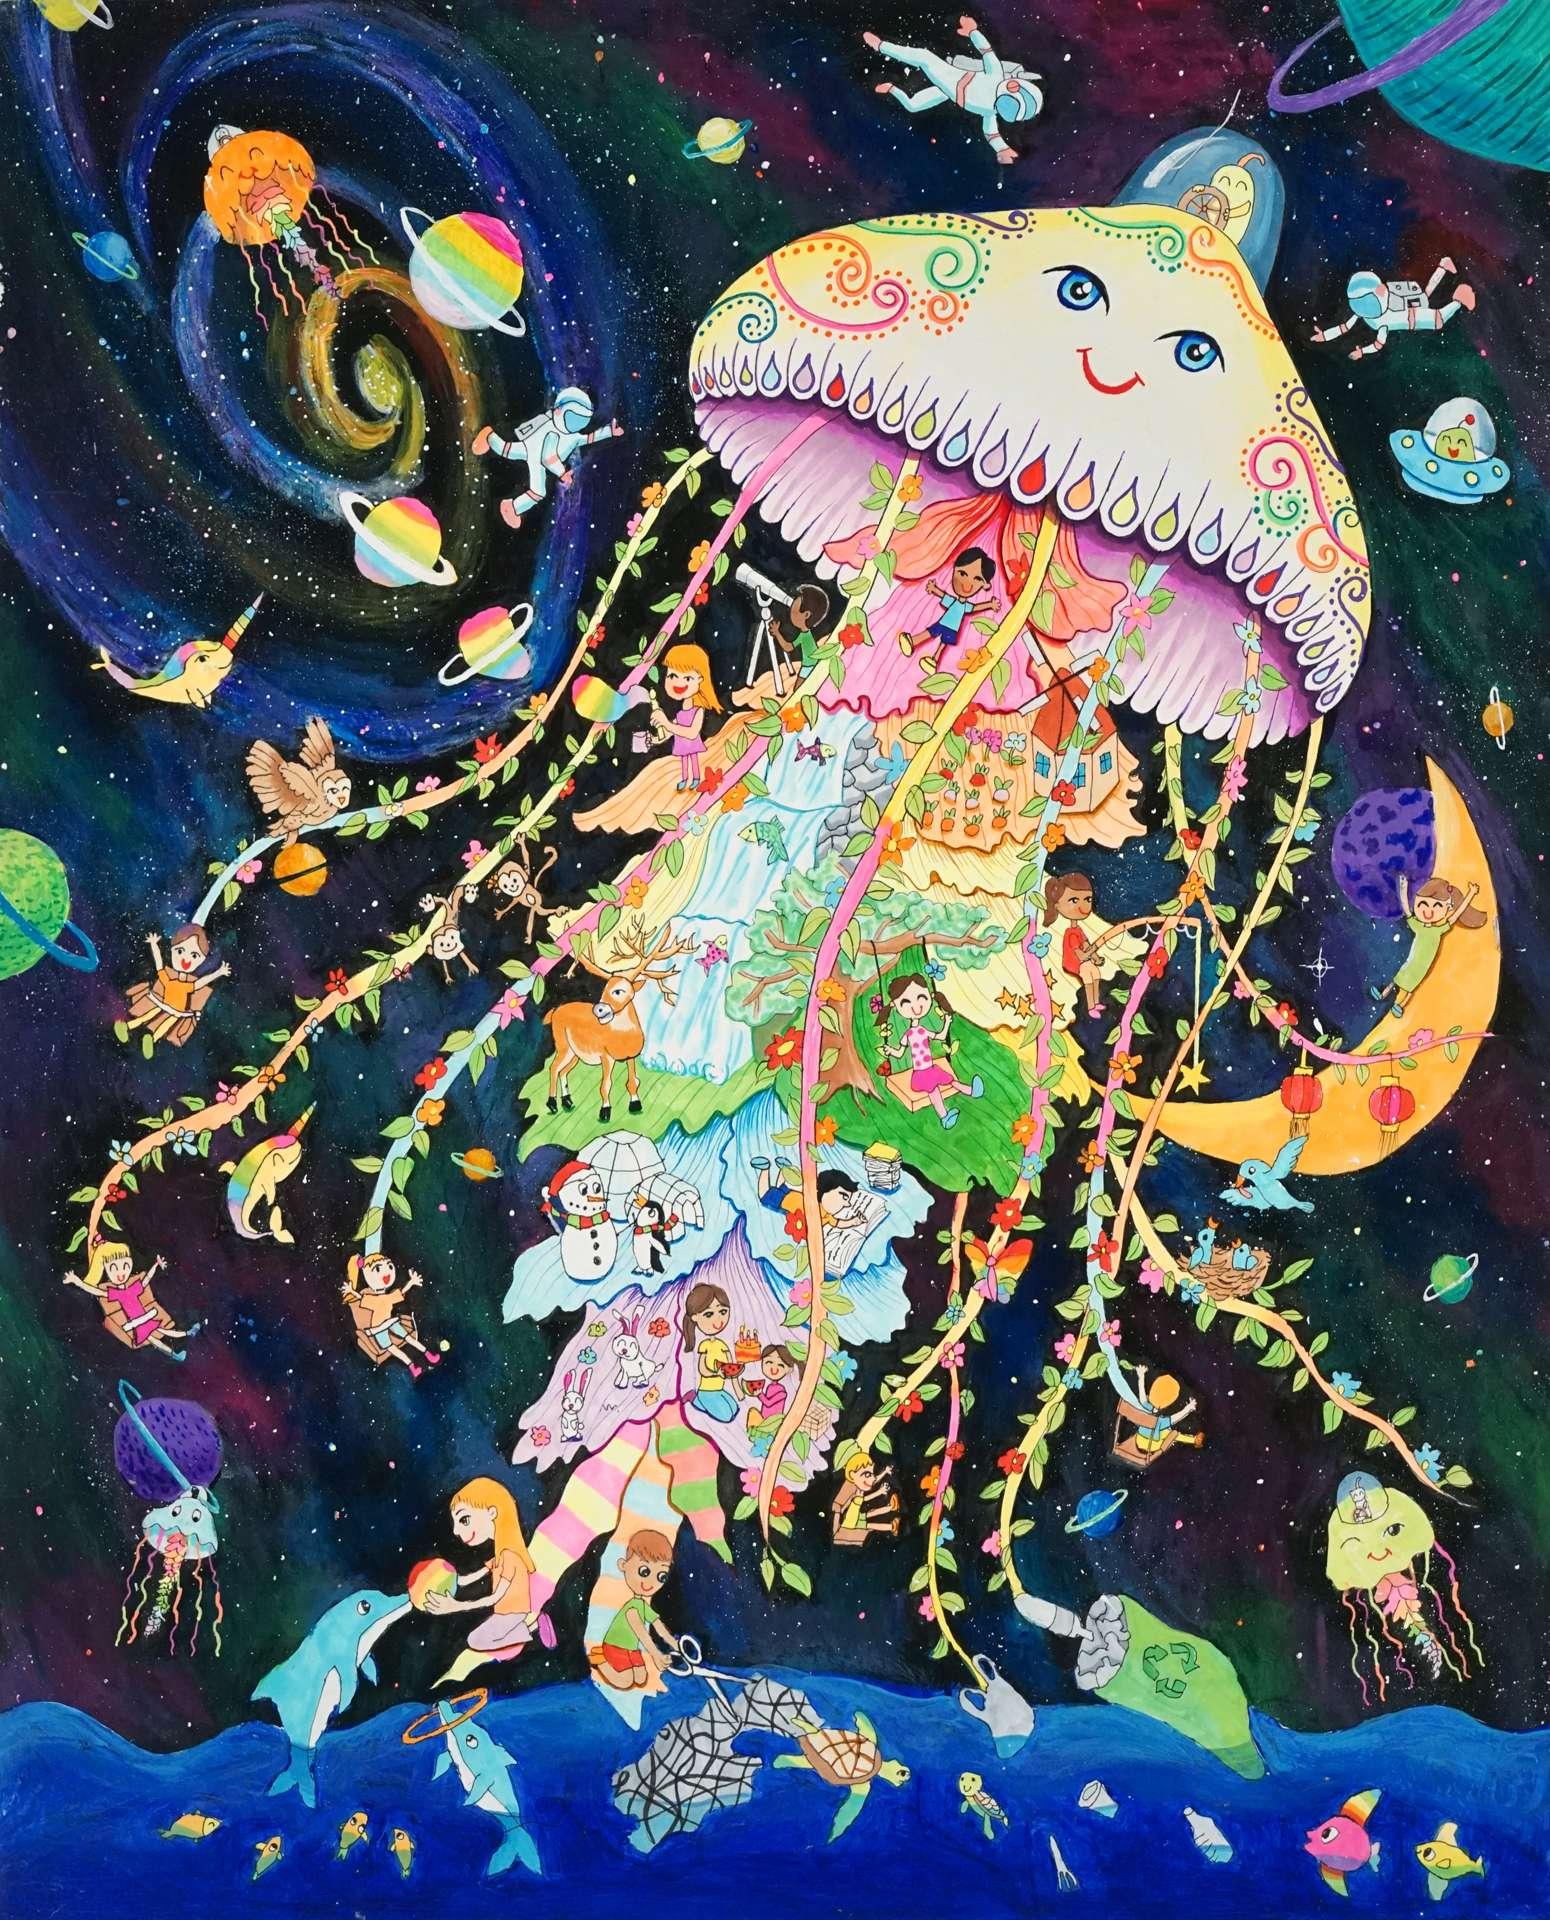 GOLD AWARD (Category 2): The Jellyfish Car by Grace Sun